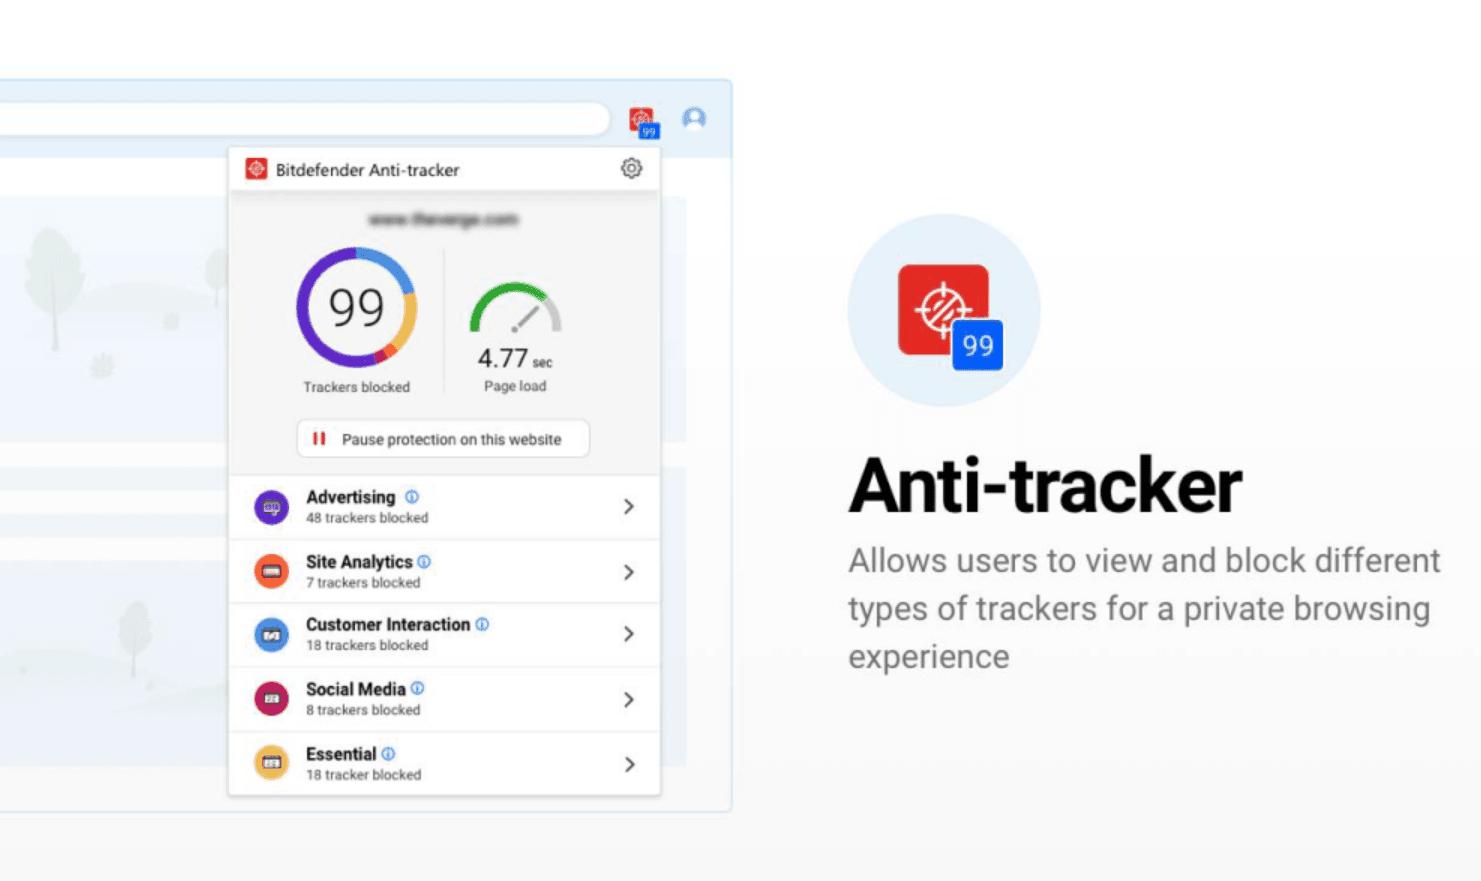 Bitdefender's Anti Tracker